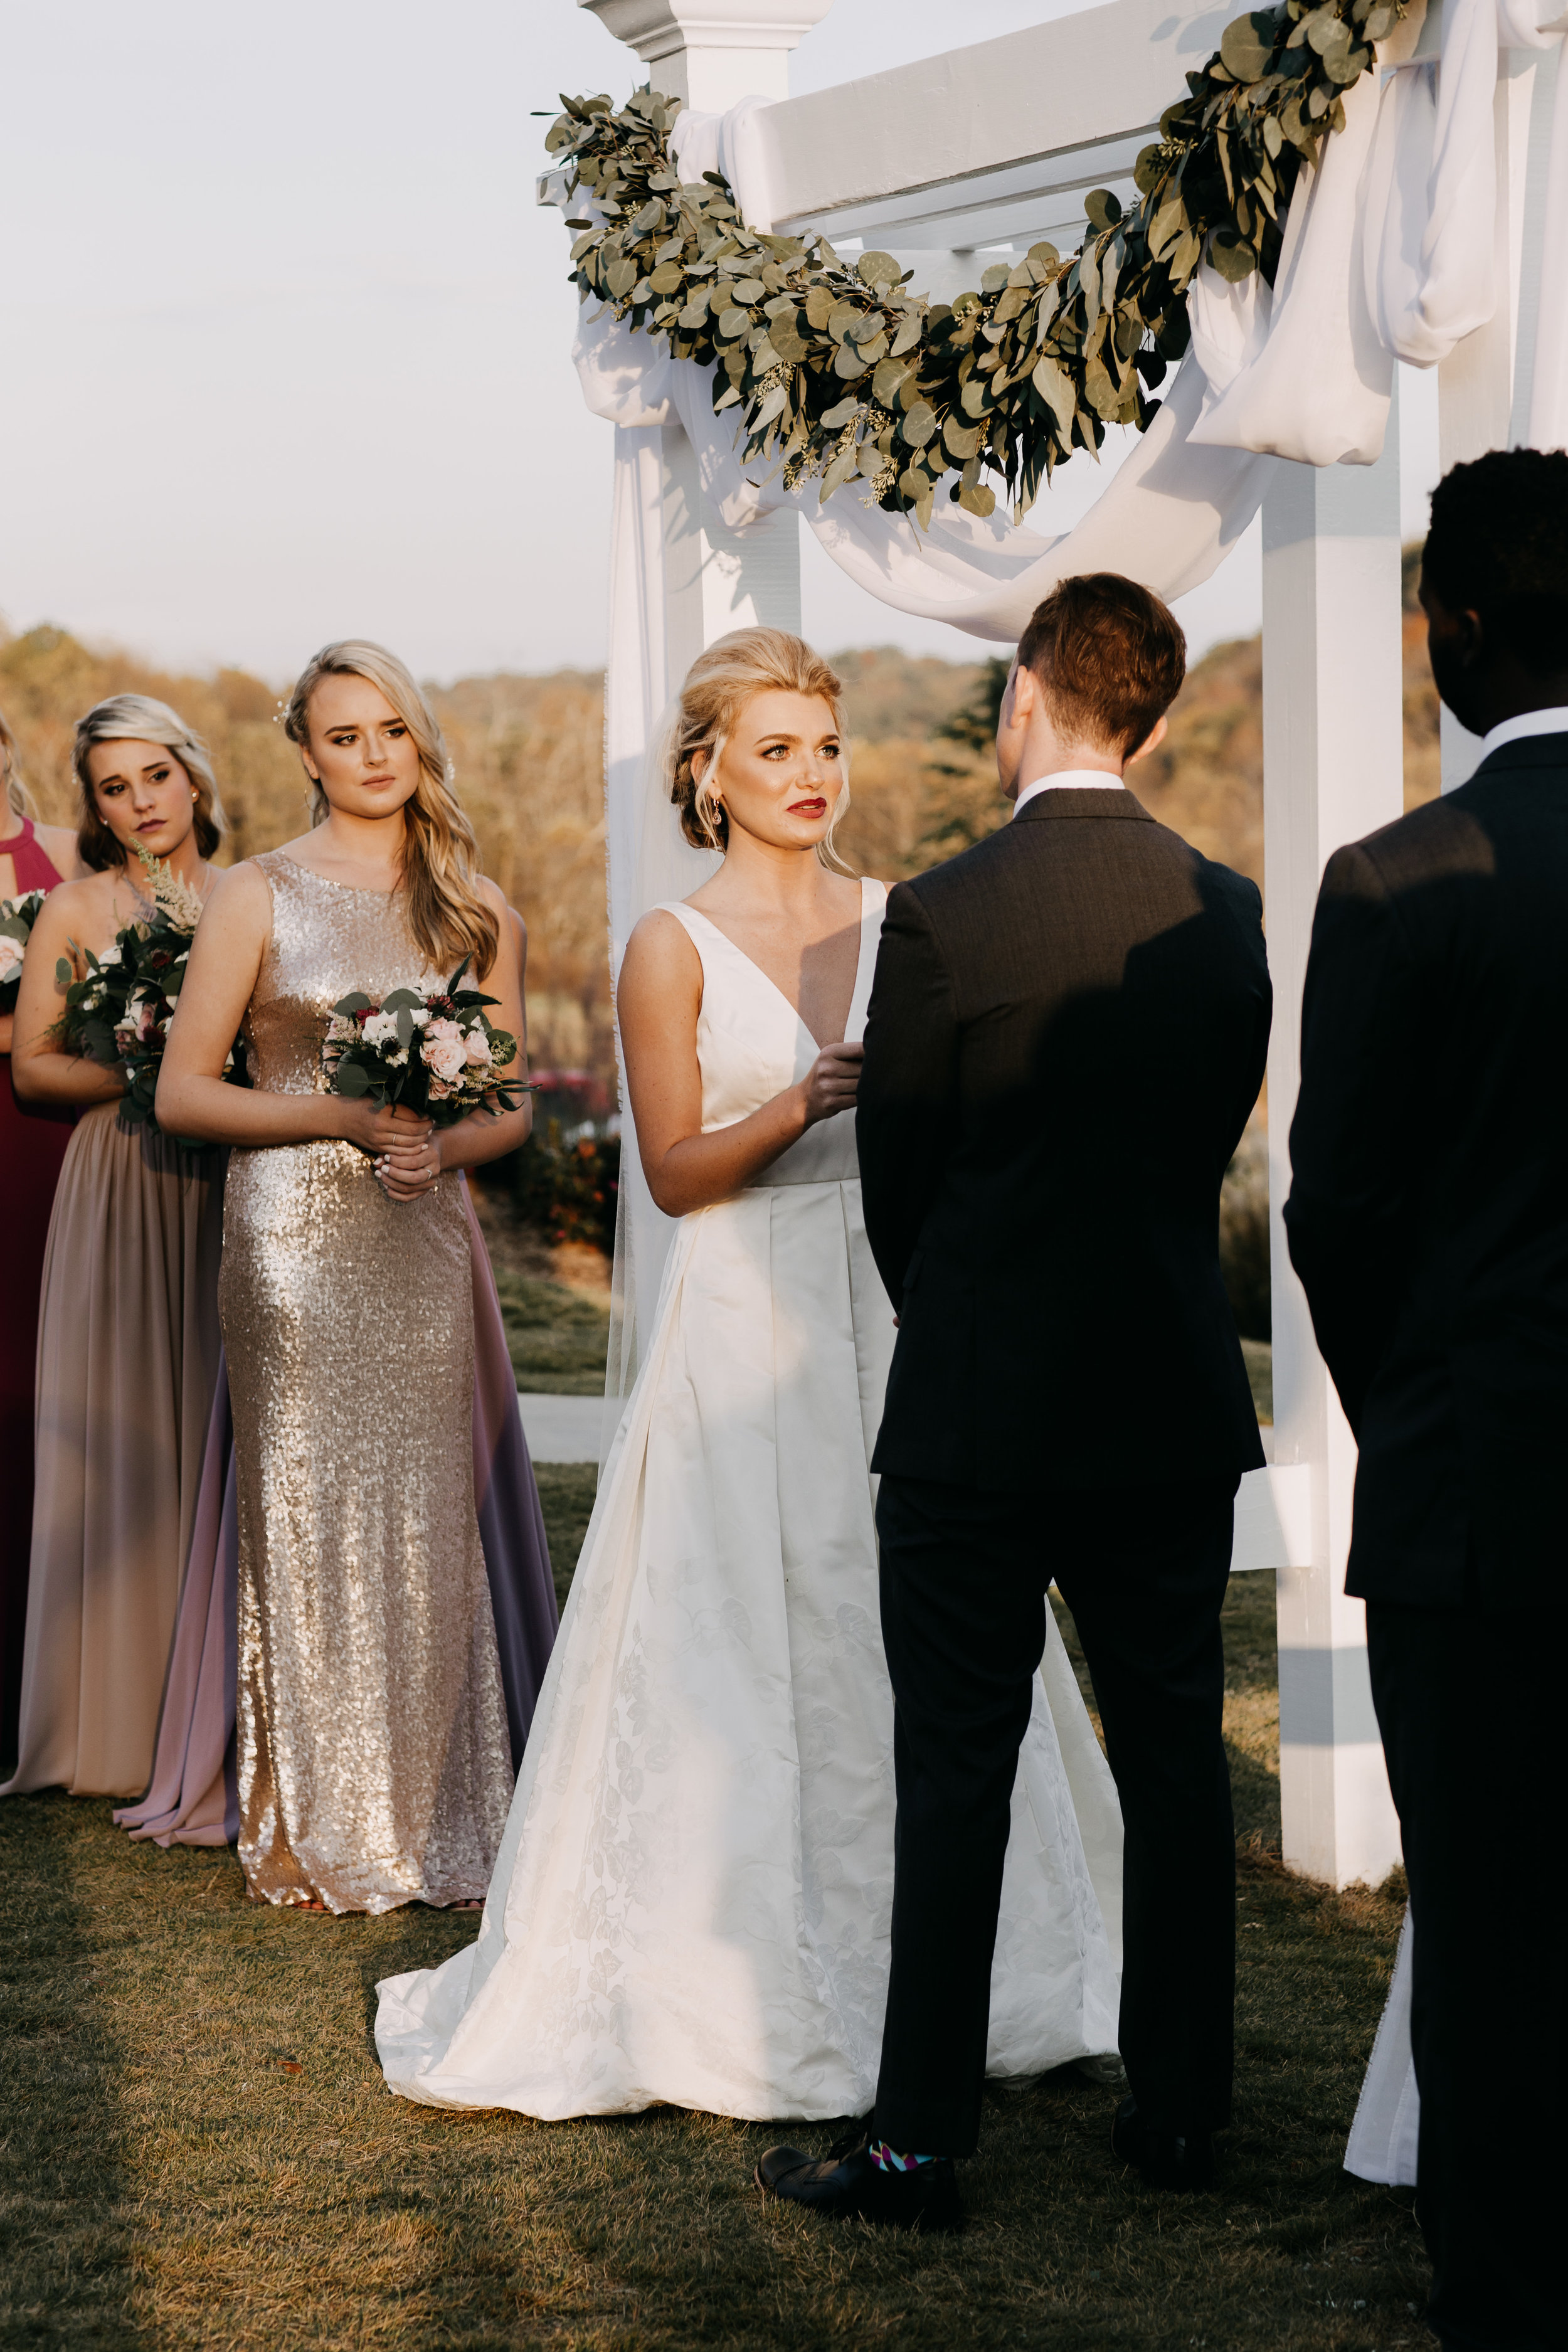 Kaylyn & Ryan Final Wedding Photos364.jpg